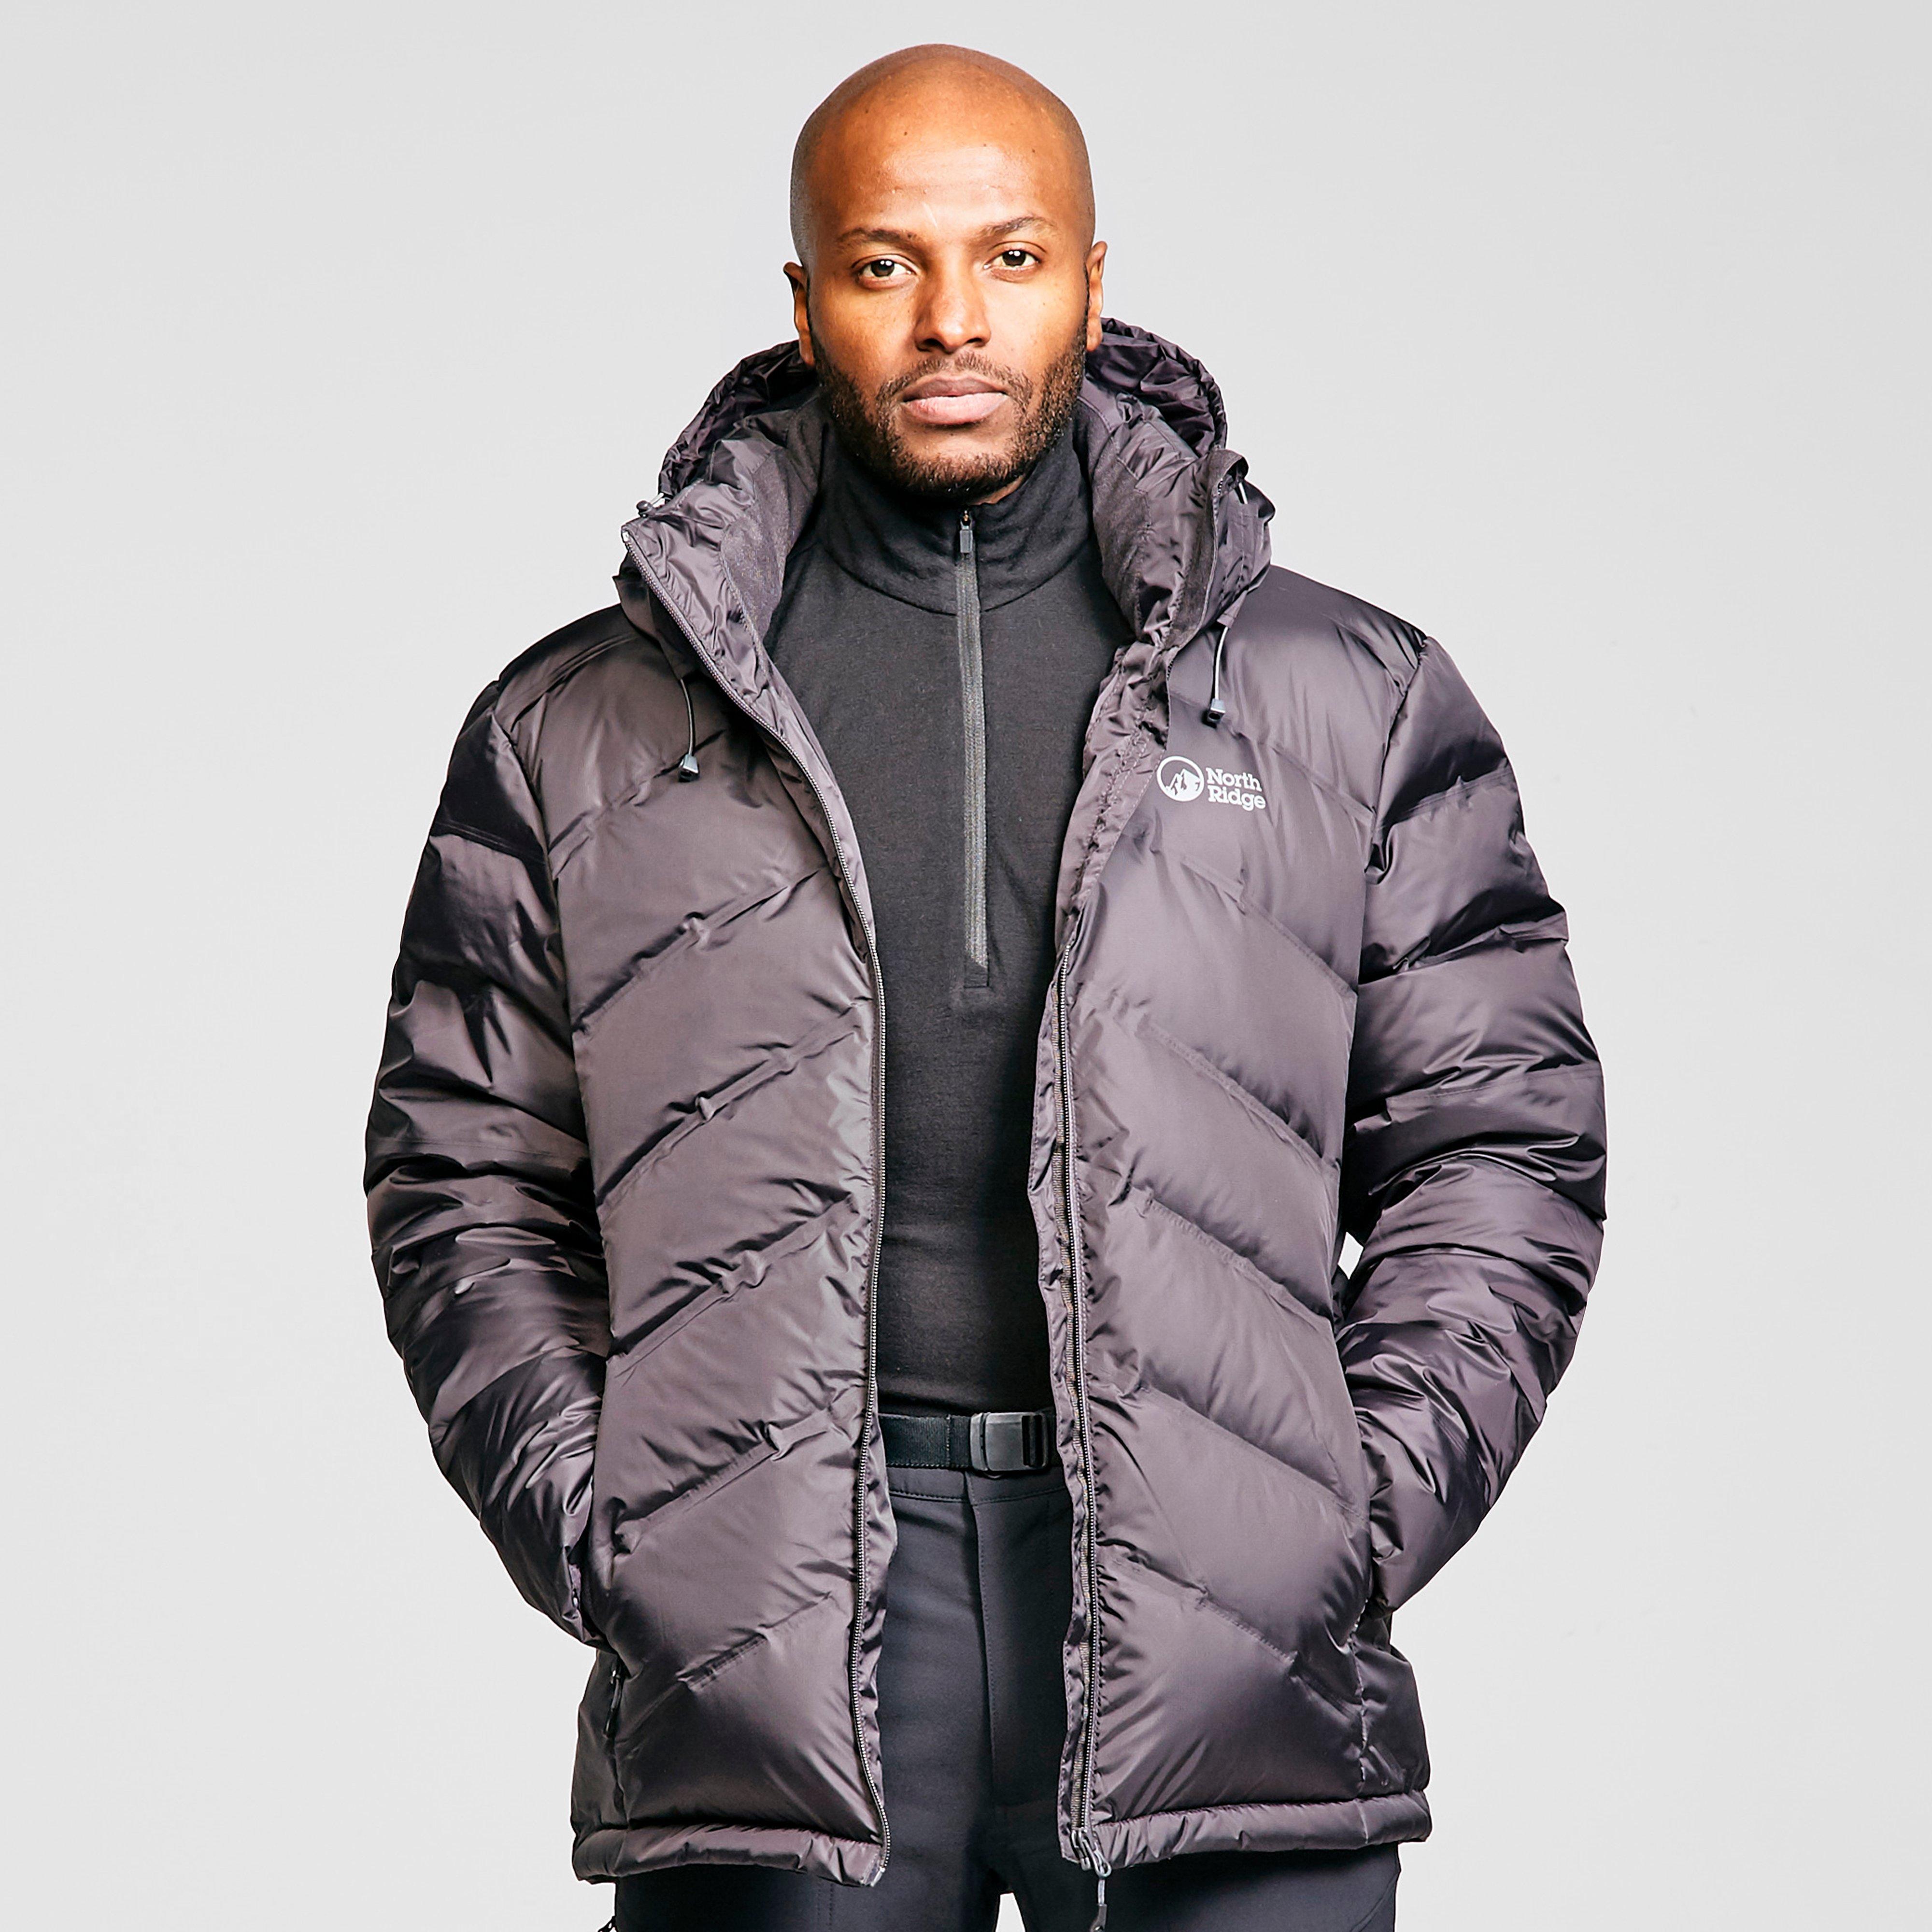 North Ridge Men's Compound Jacket - Black/Blk, Black